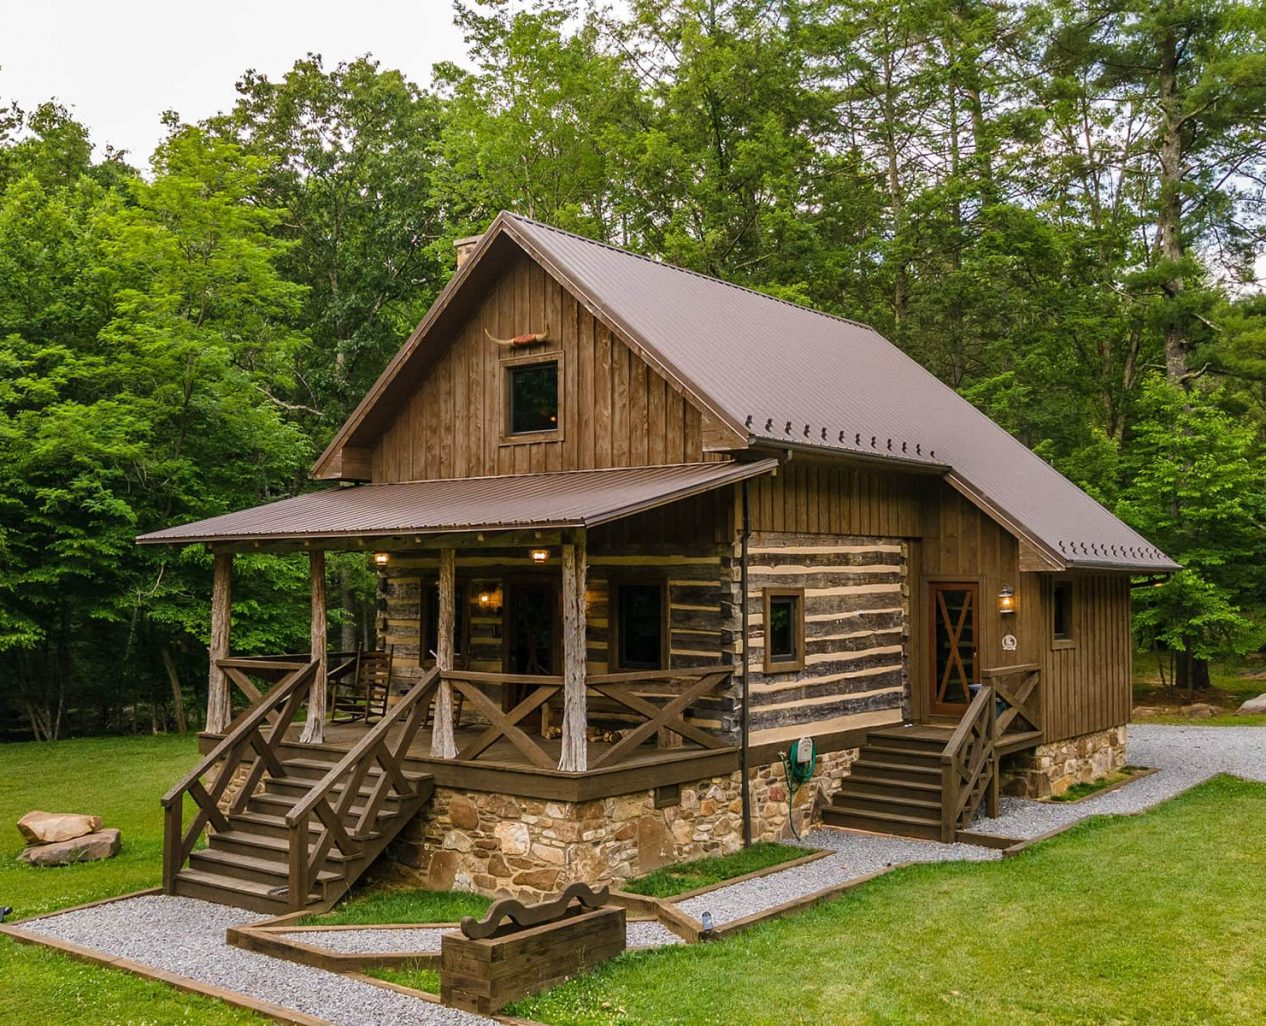 Cowboy Cabin exterior view